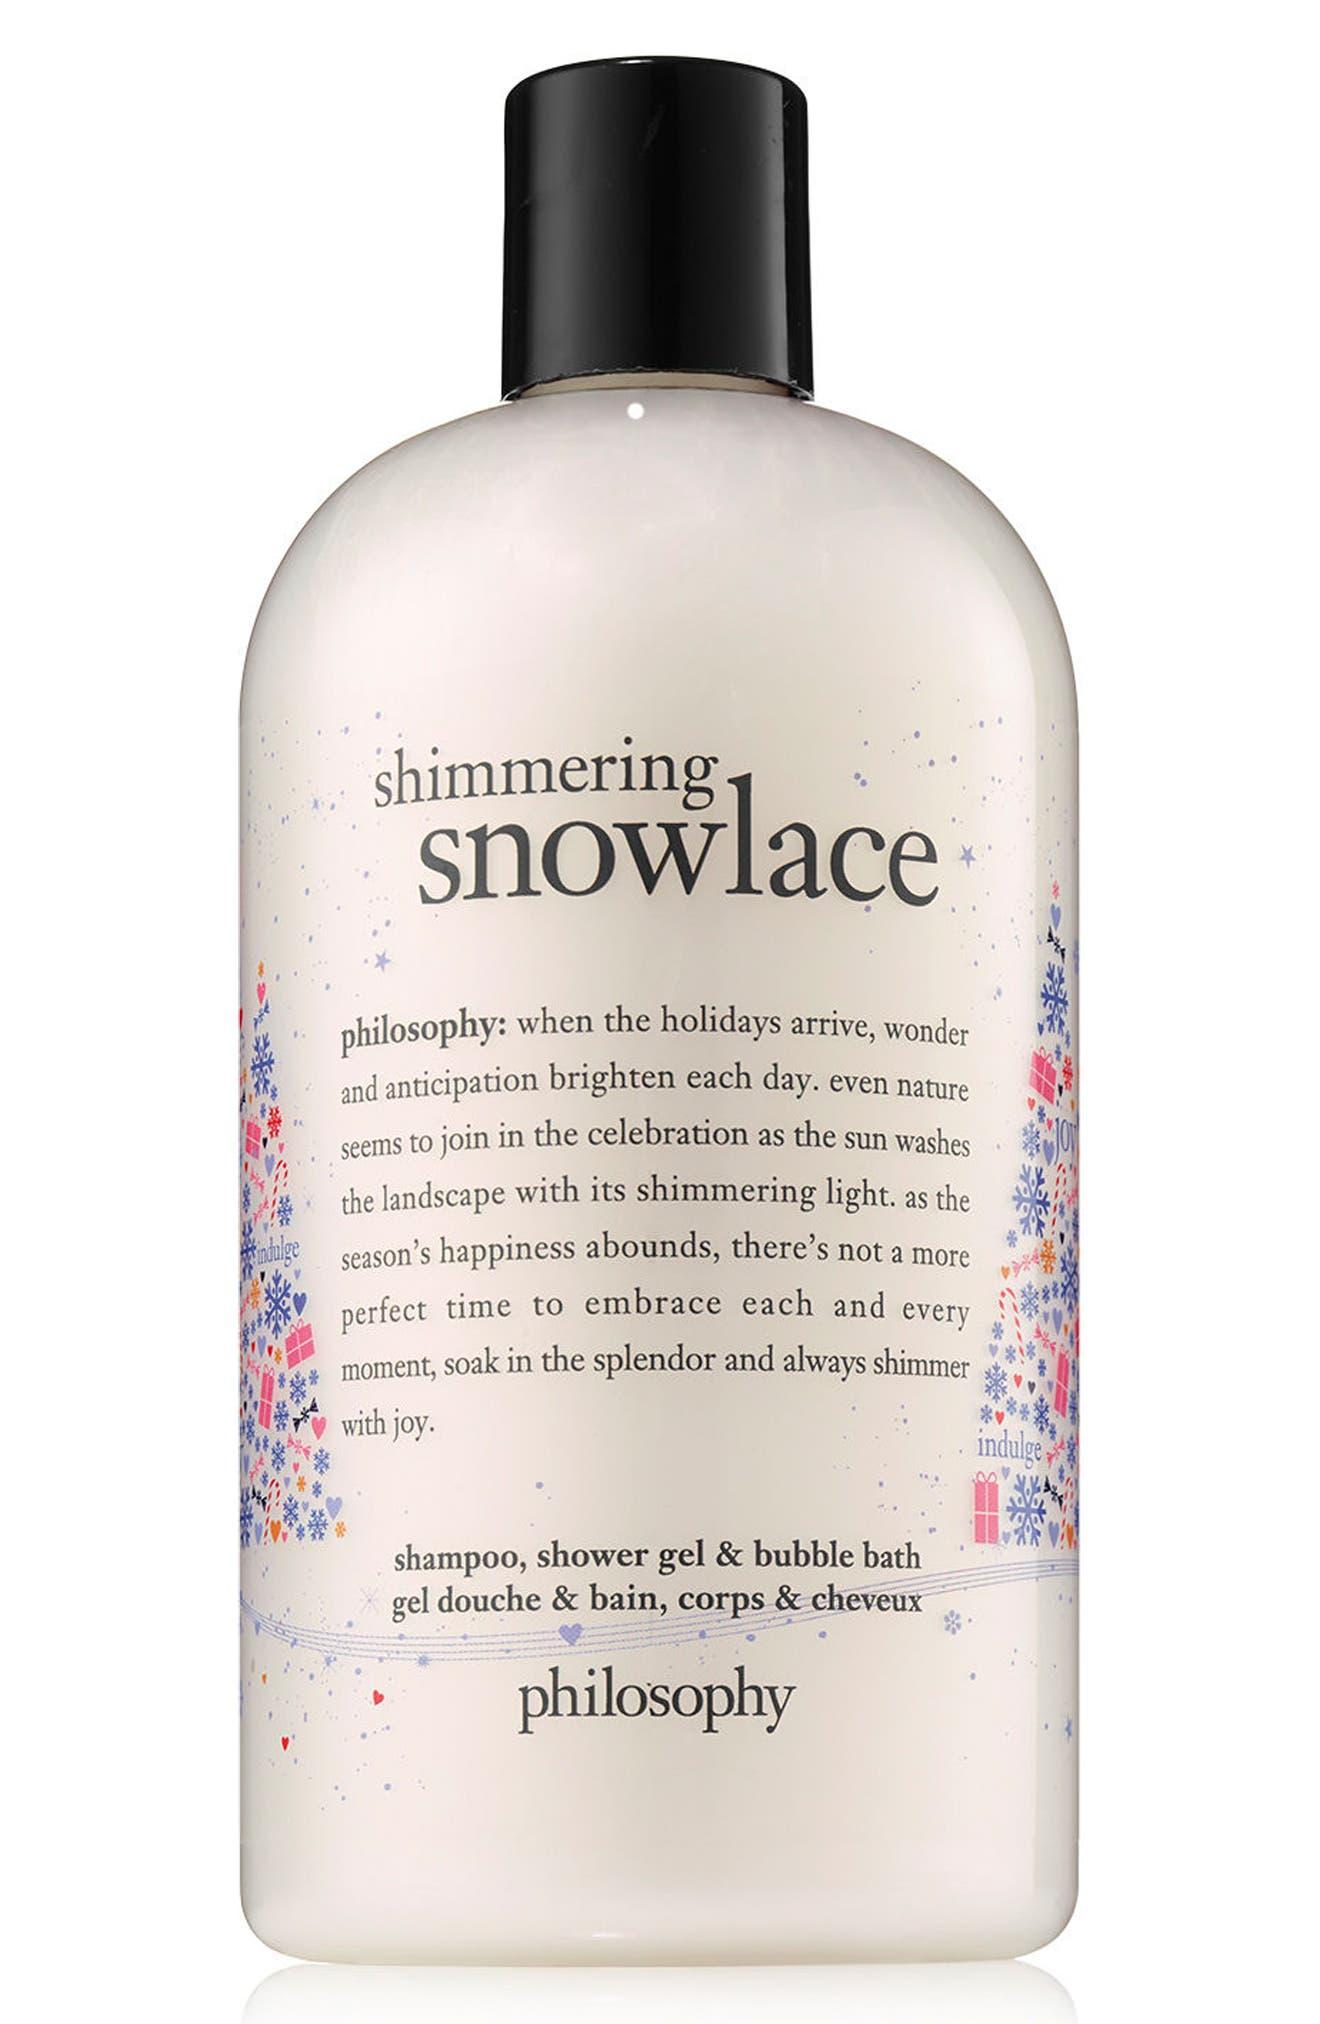 shimmering snowlace shampoo, shower gel & bubble bath,                         Main,                         color,